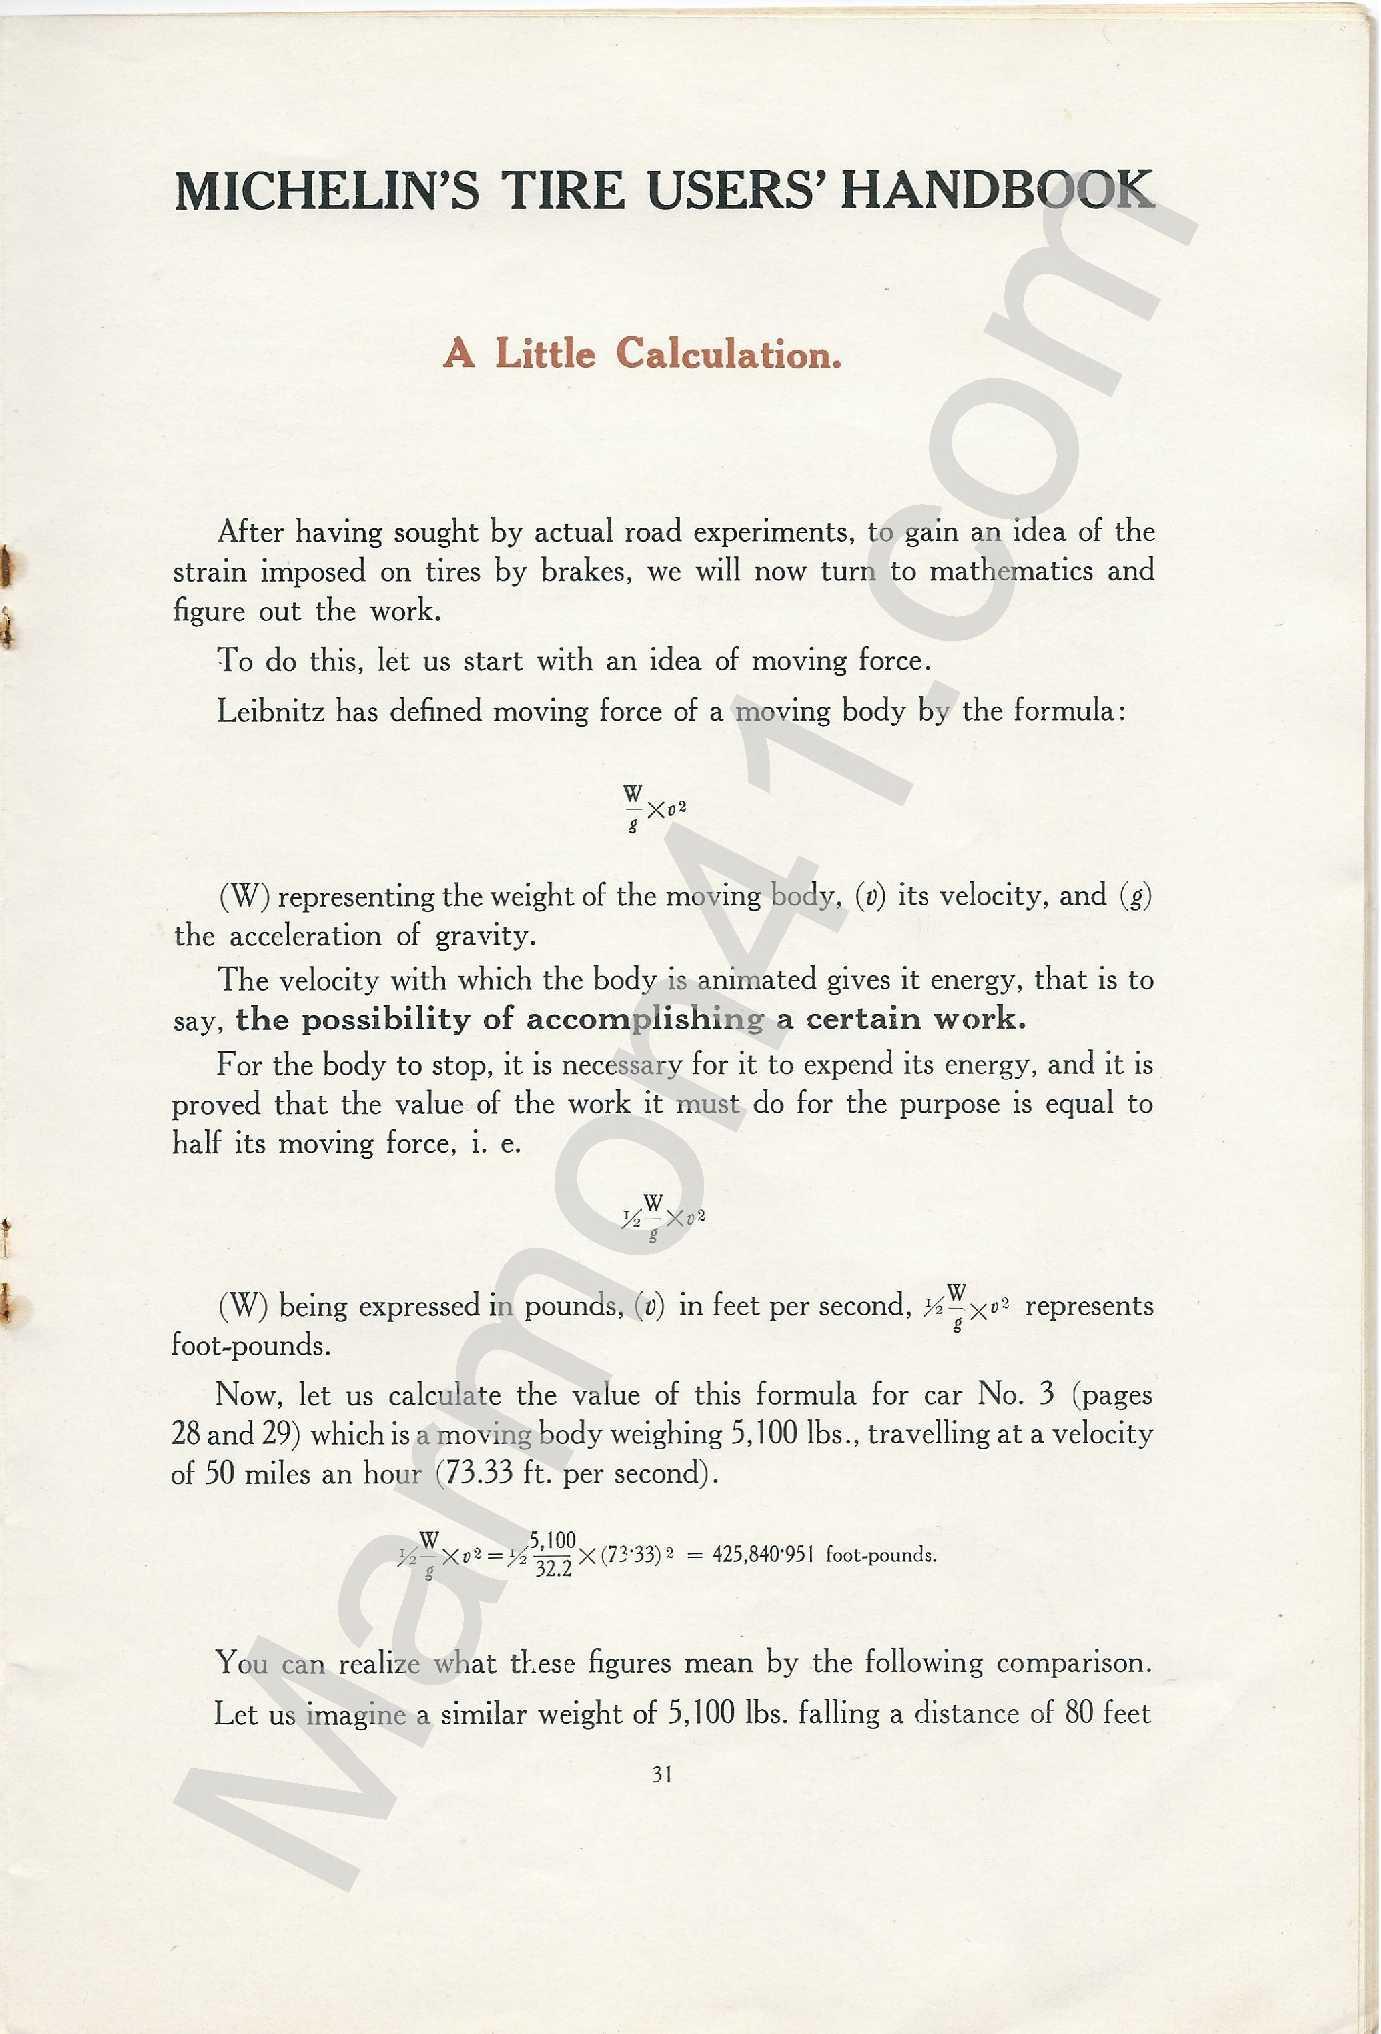 Michelins Tire Users Handbook_31